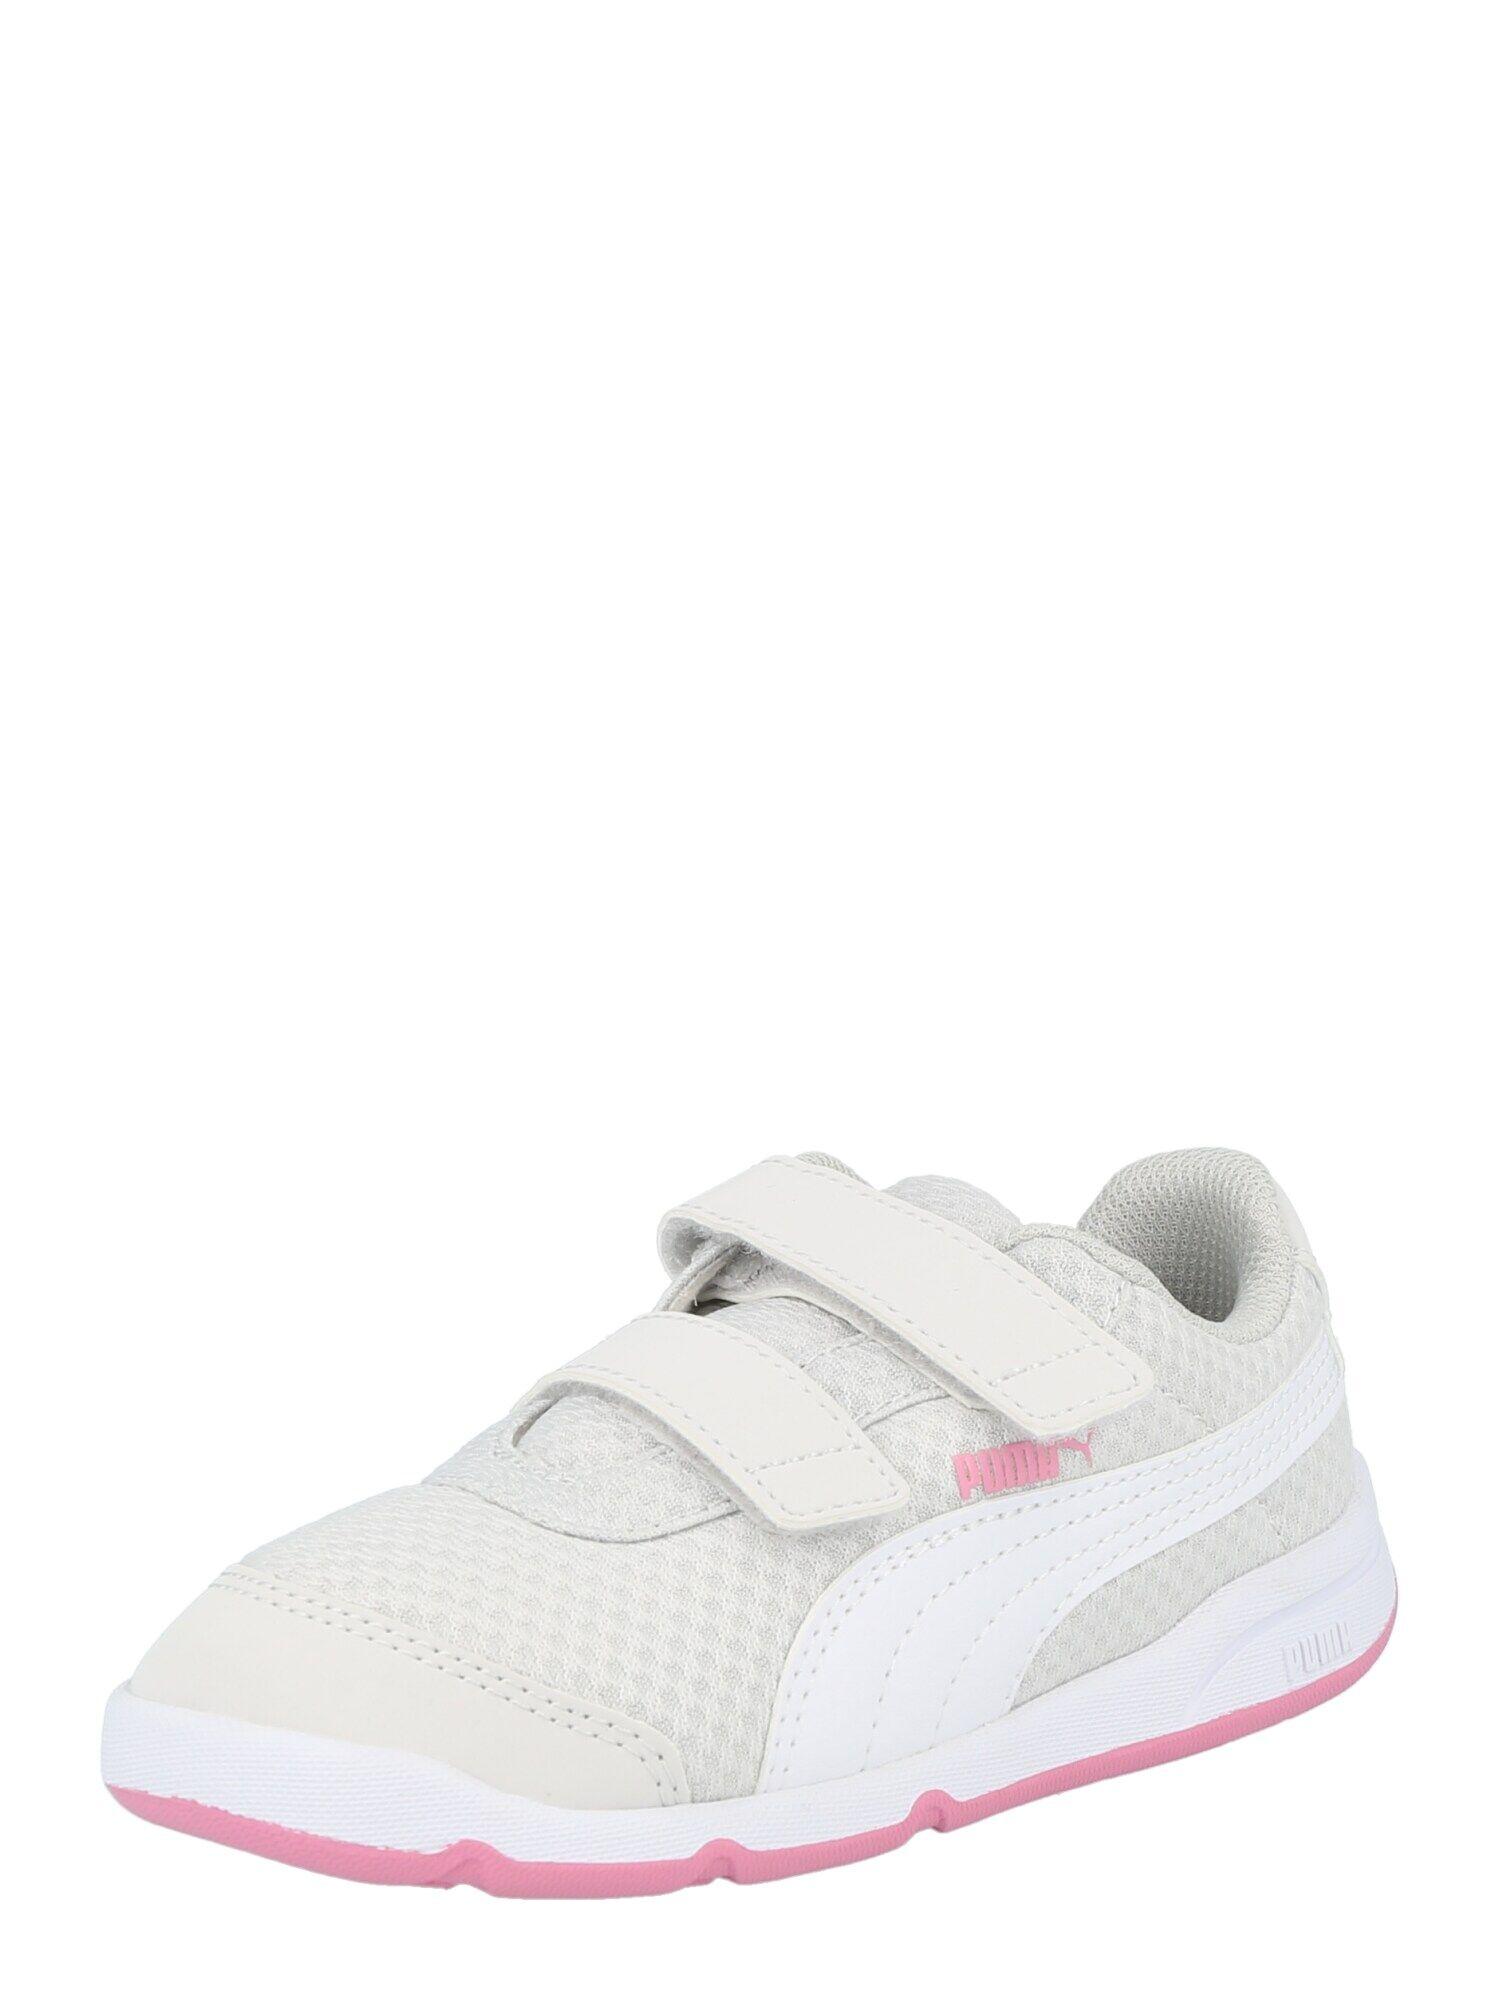 PUMA Sneaker 'Stepfleex' Grigio